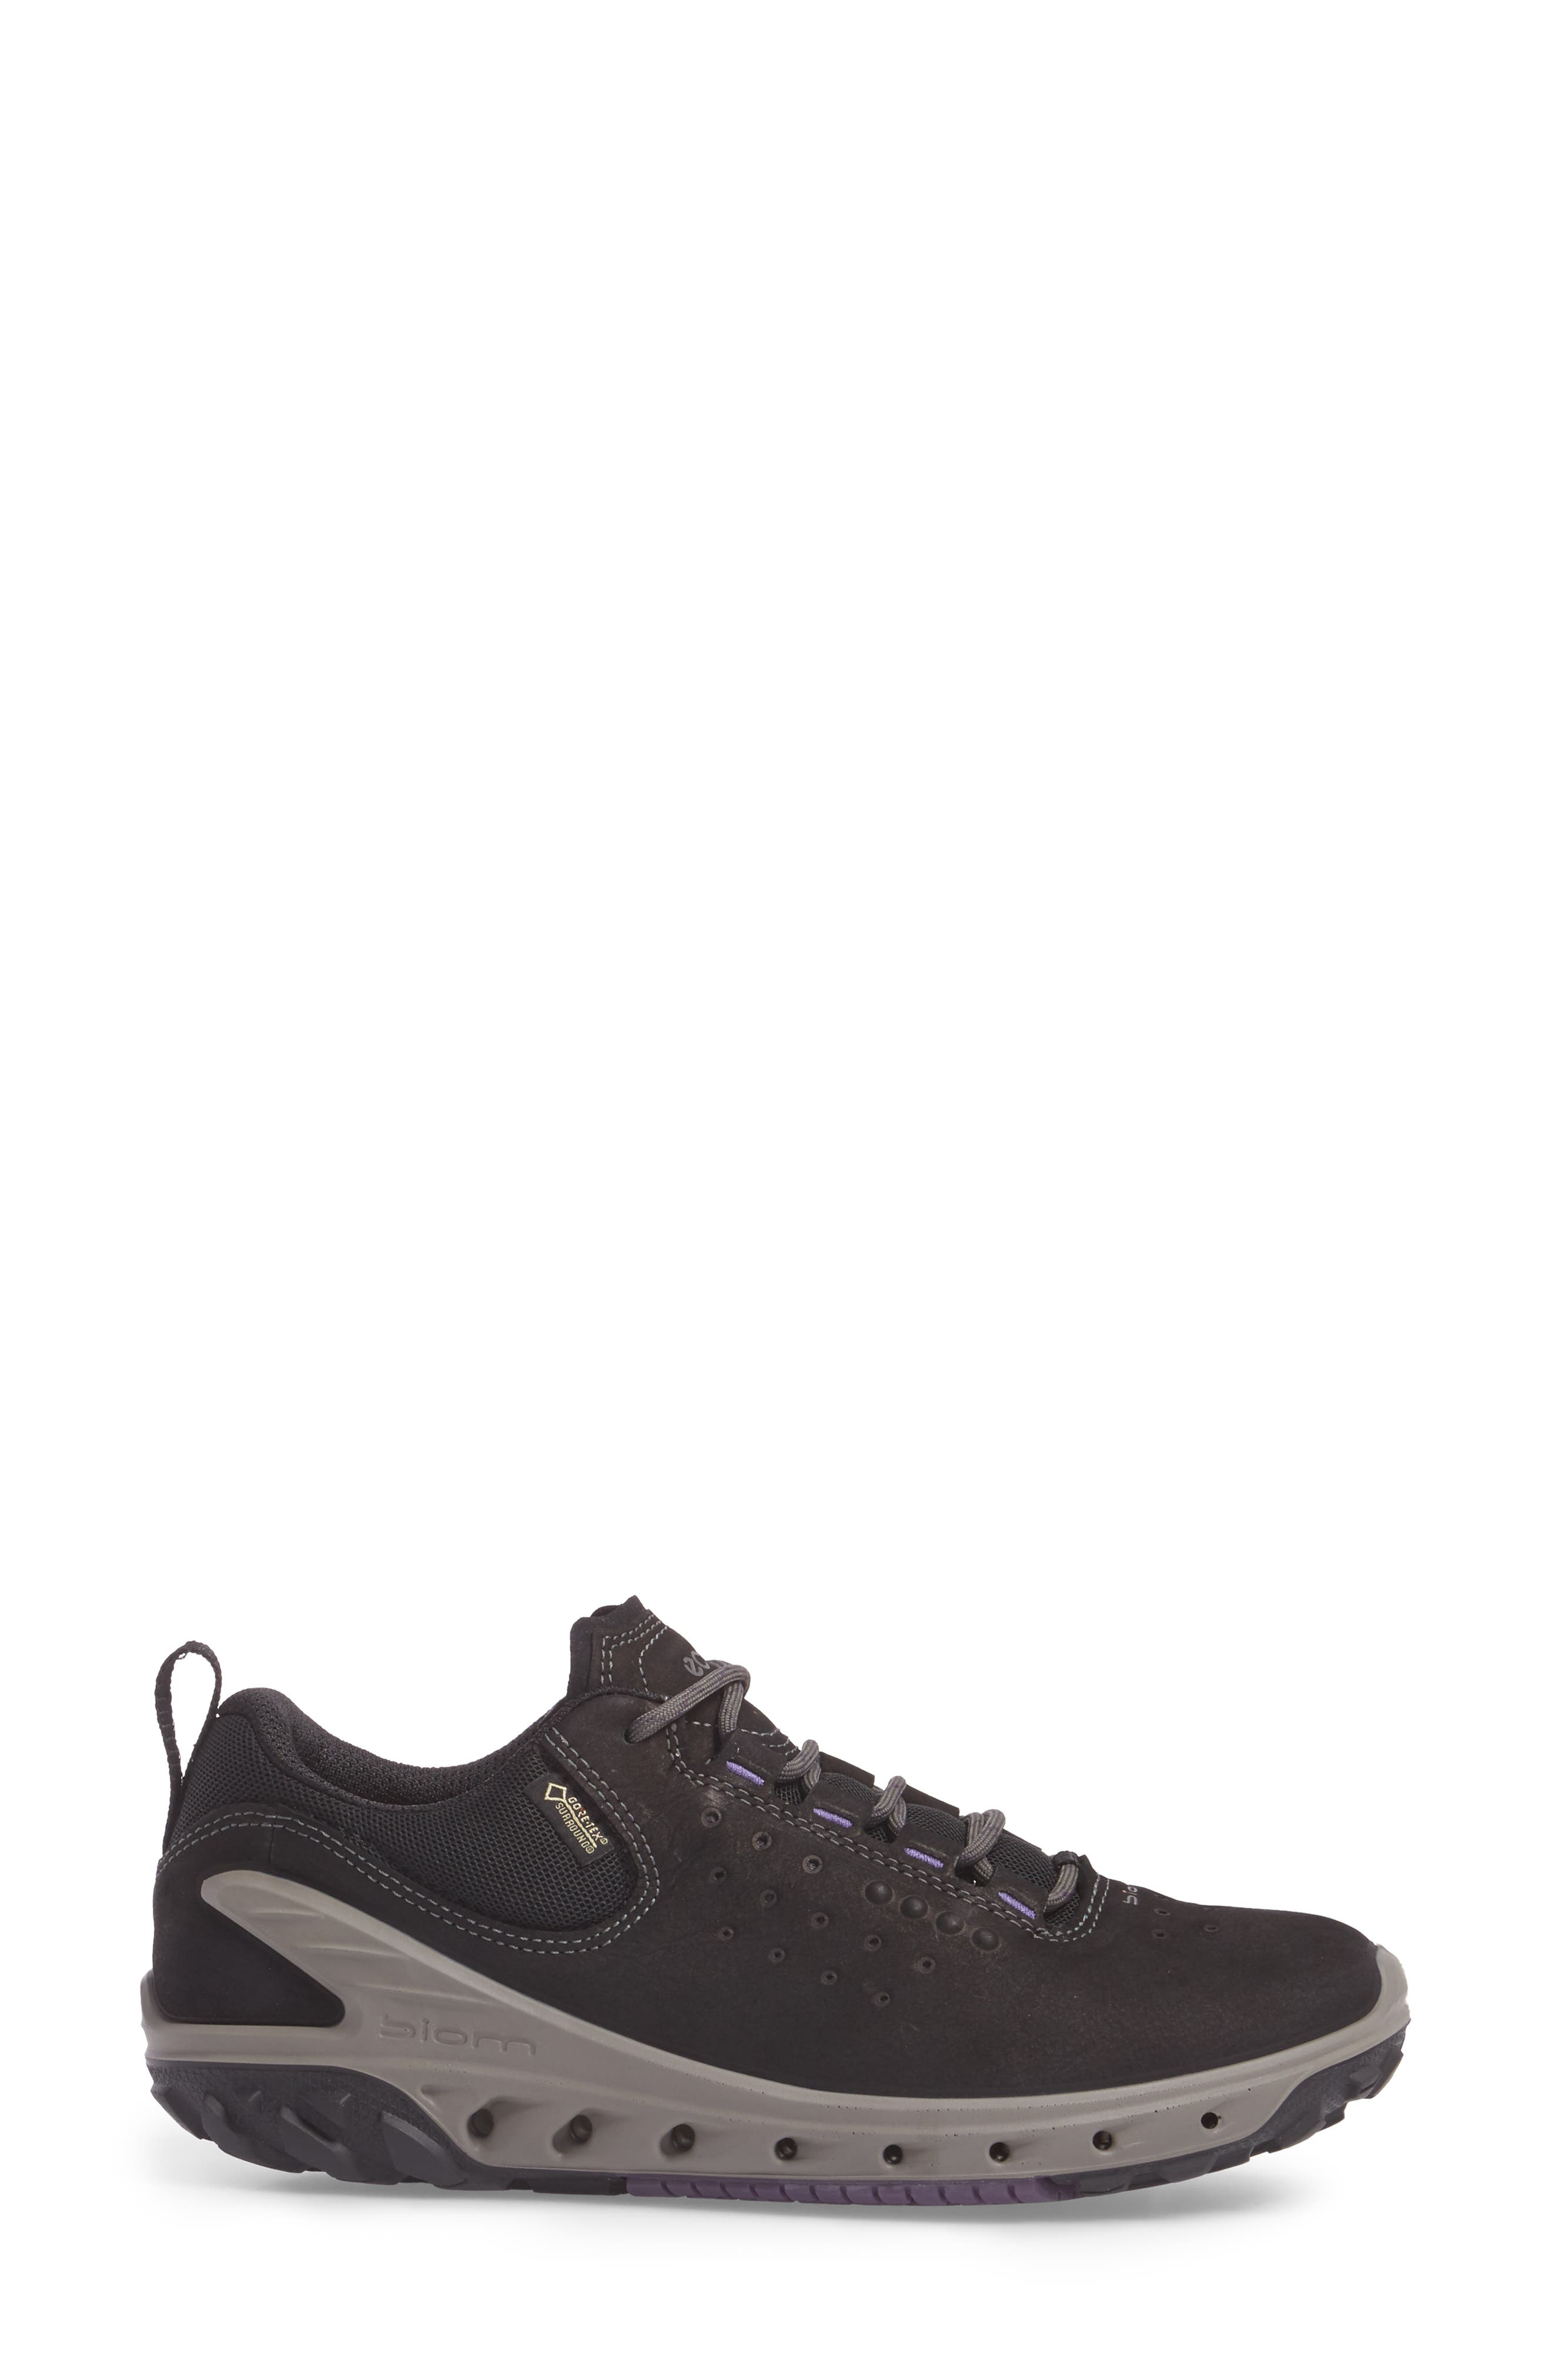 BIOM Venture GTX Sneaker,                             Alternate thumbnail 3, color,                             BLACK LEATHER